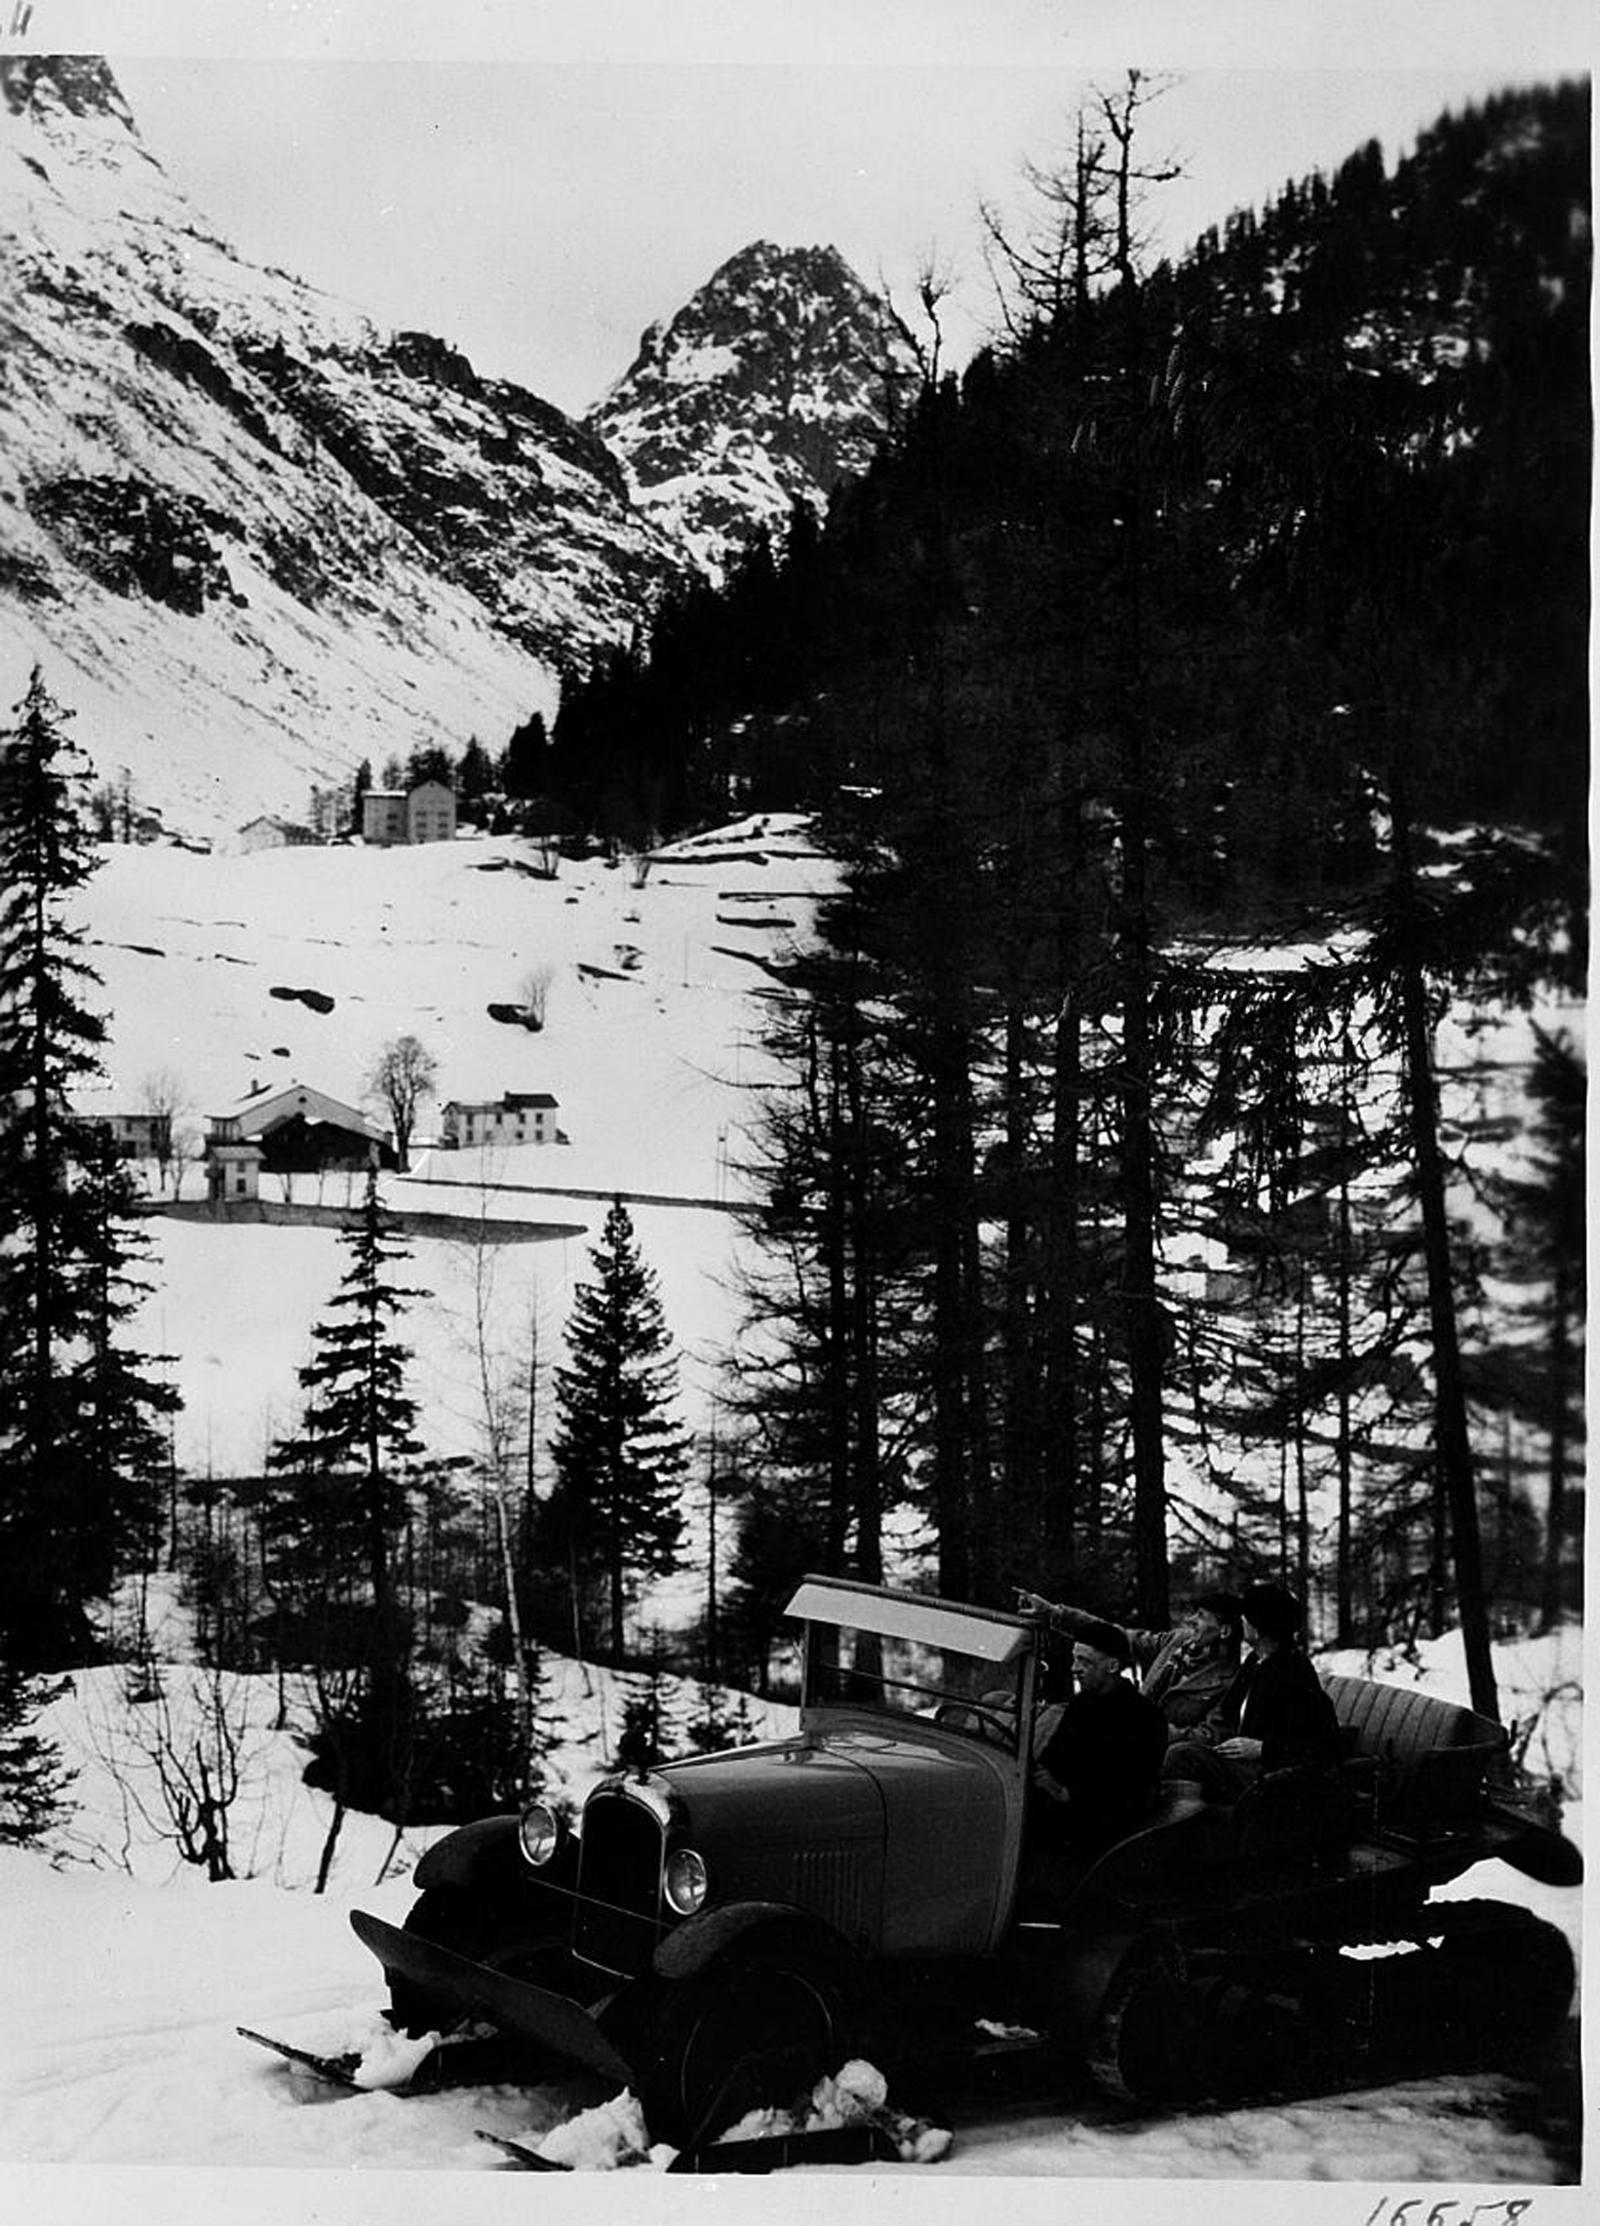 Type K1 - Col des Montets